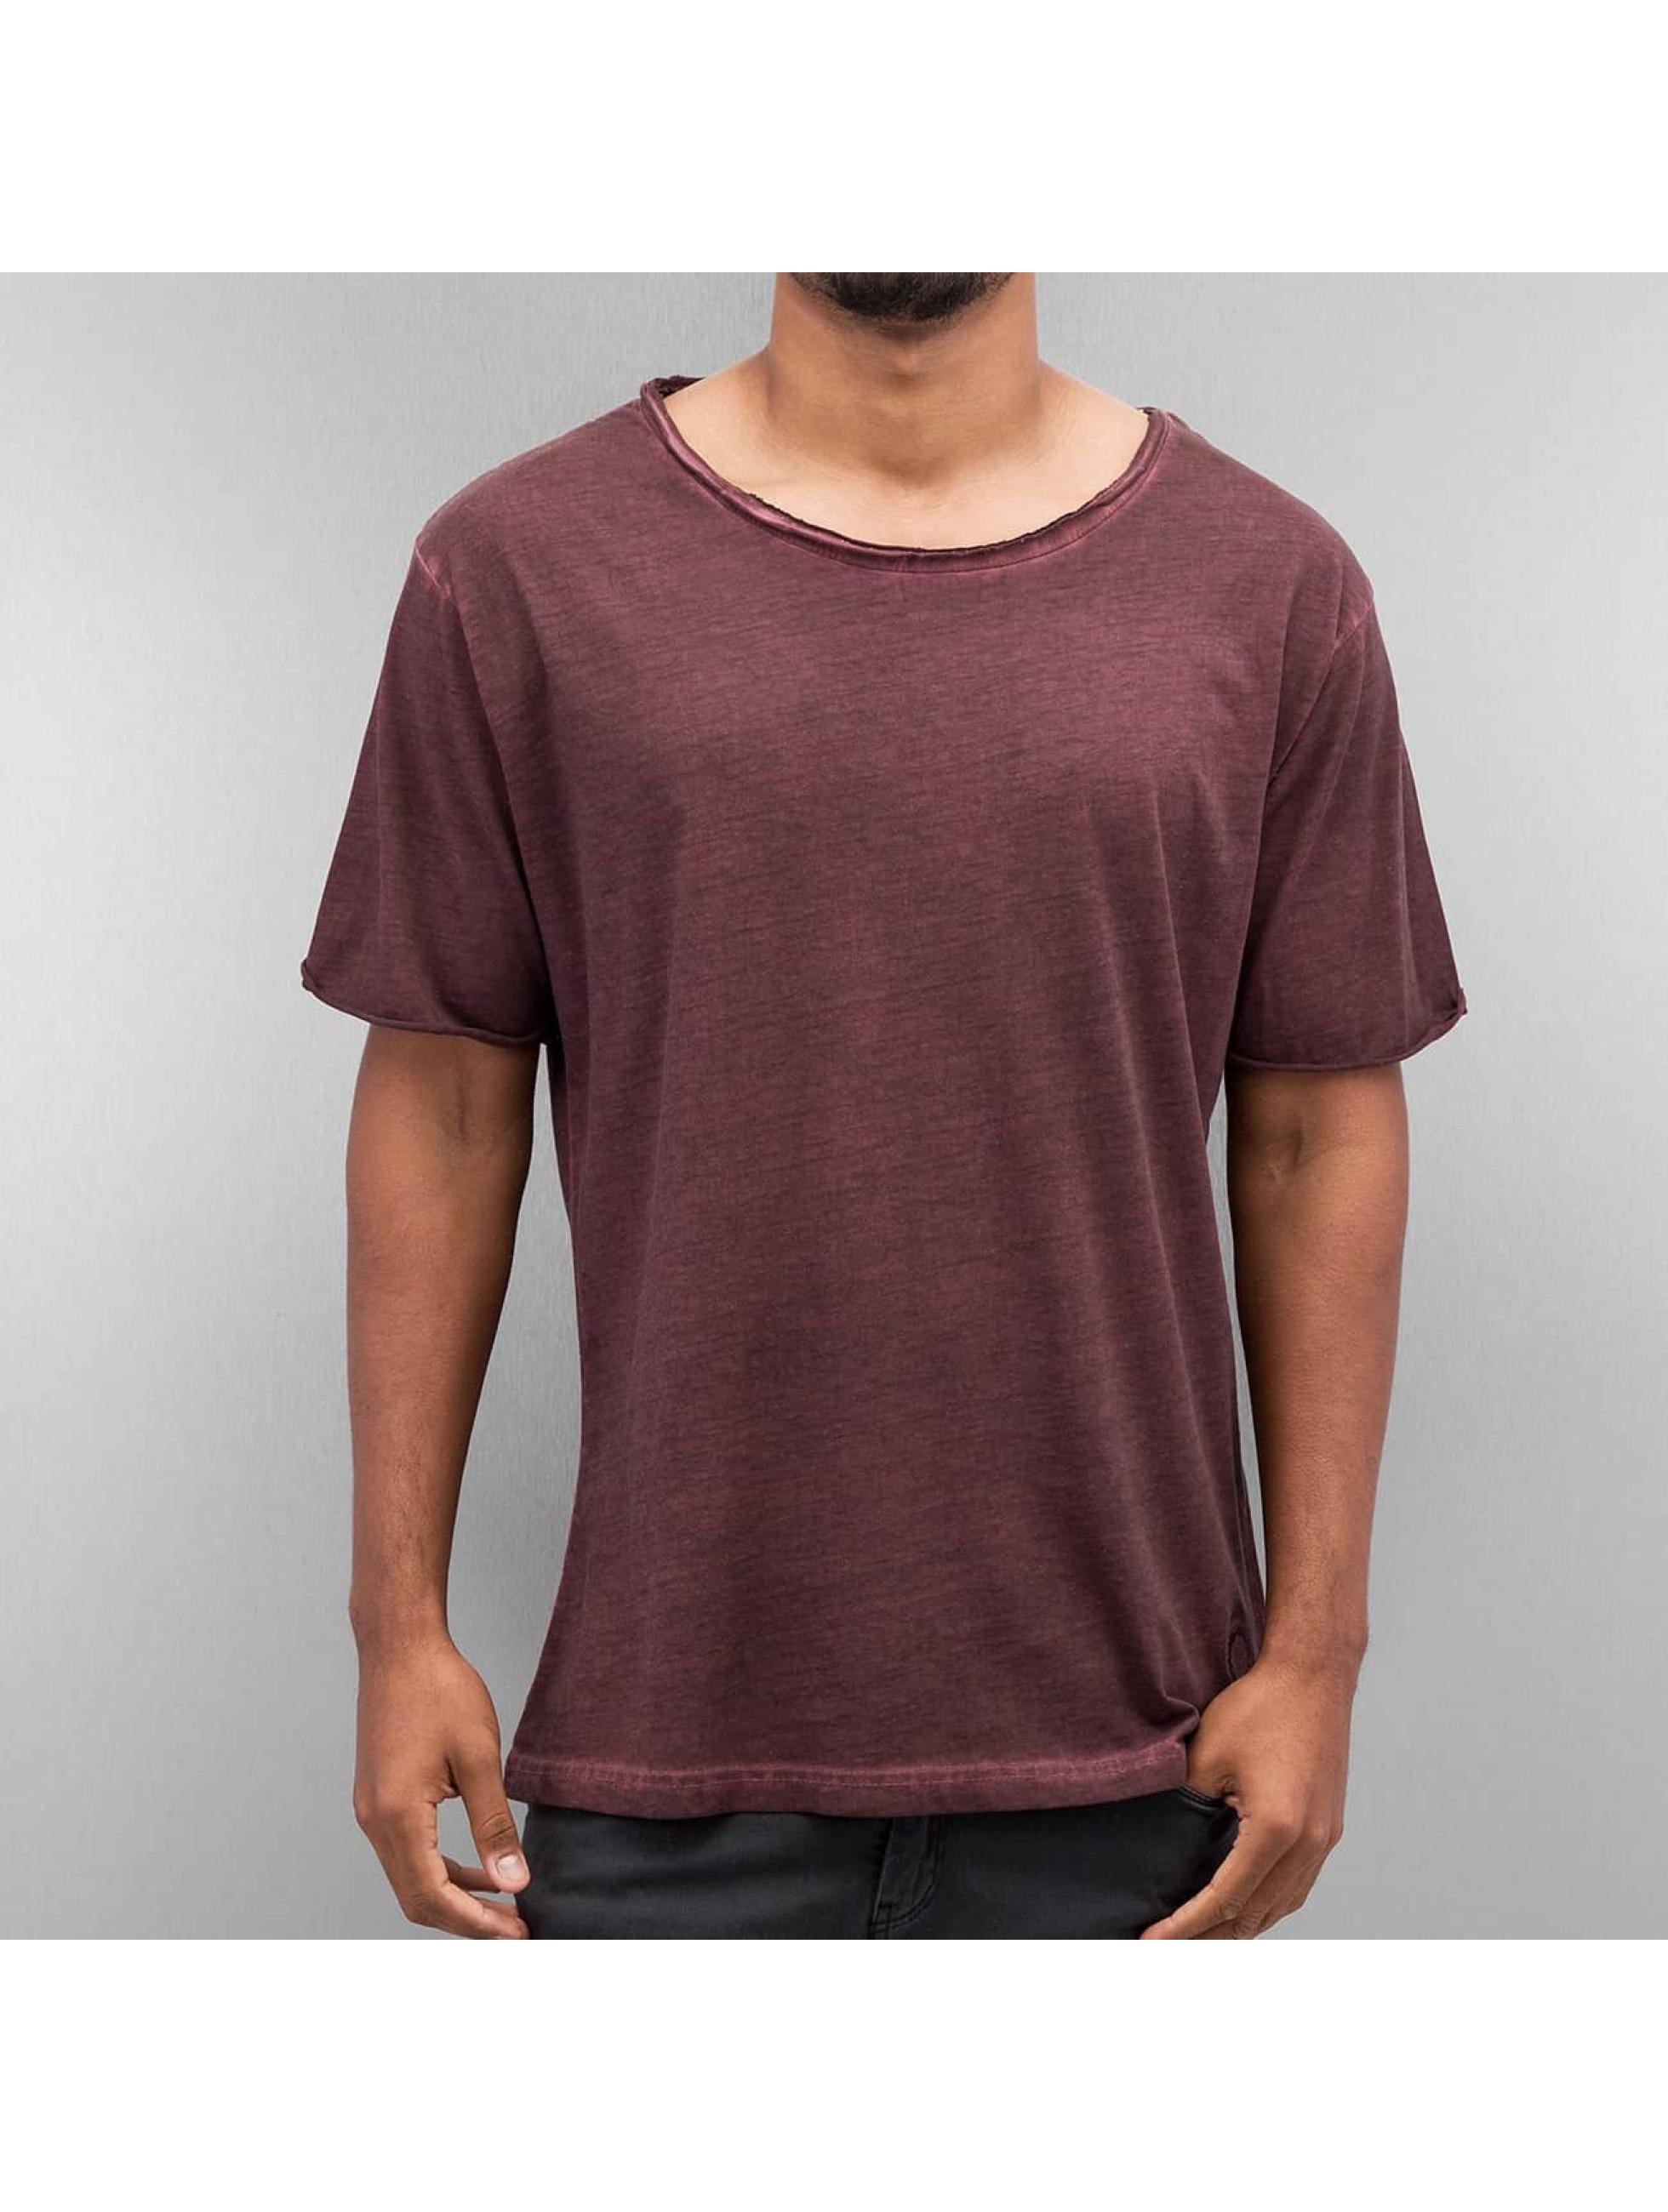 Yezz T-Shirt Dyed rot